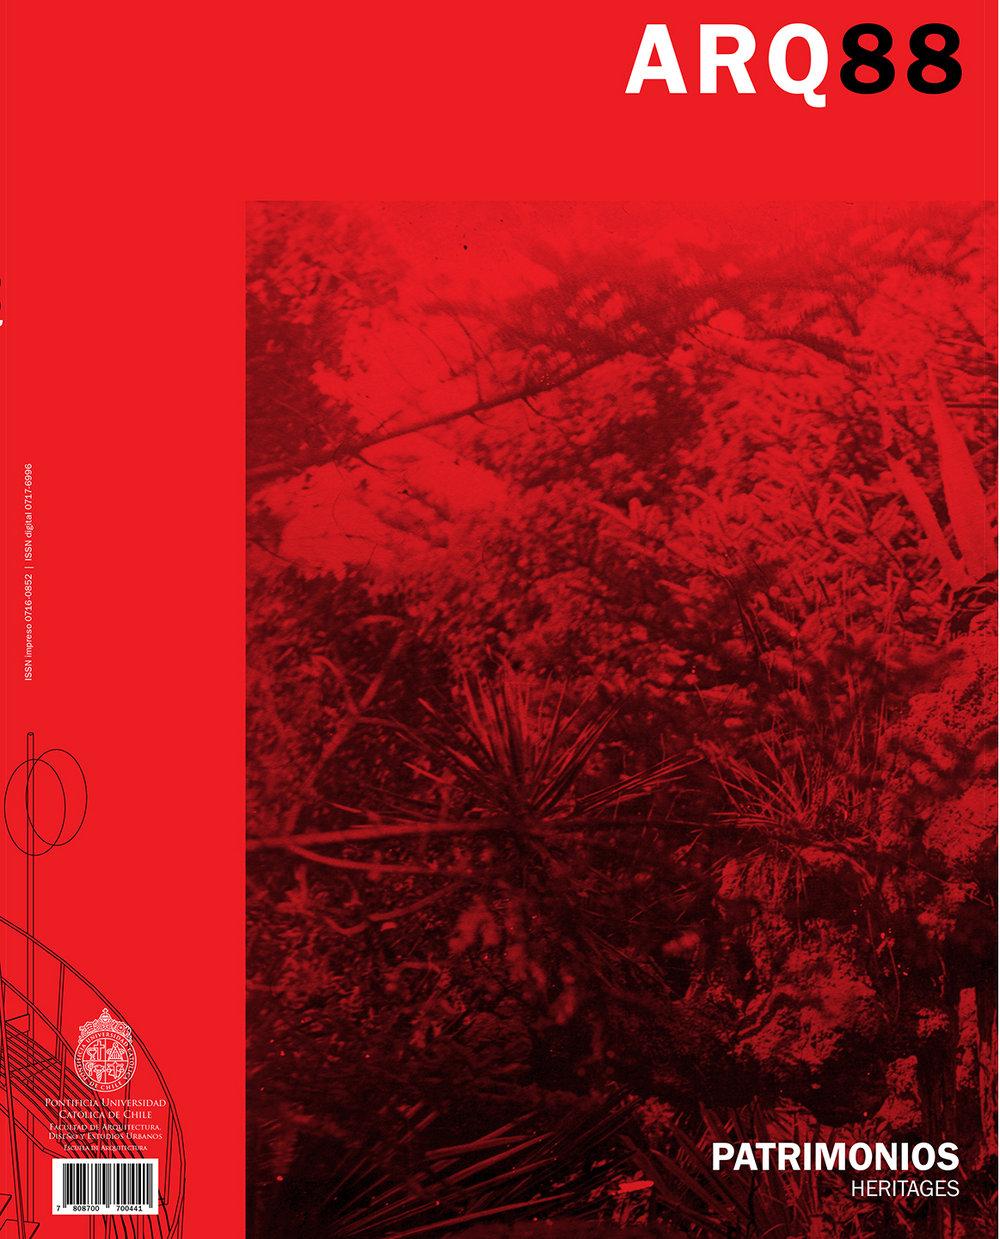 ARQ 88 (2014)  Patrimonios | Heritage  64 pages  Spanish  Softcover, 27 x 23 cm.  Published by Pontificia Universidad Católica de Chile, Facultad de Arquitectura, Diseño y Estudios Urbanos.